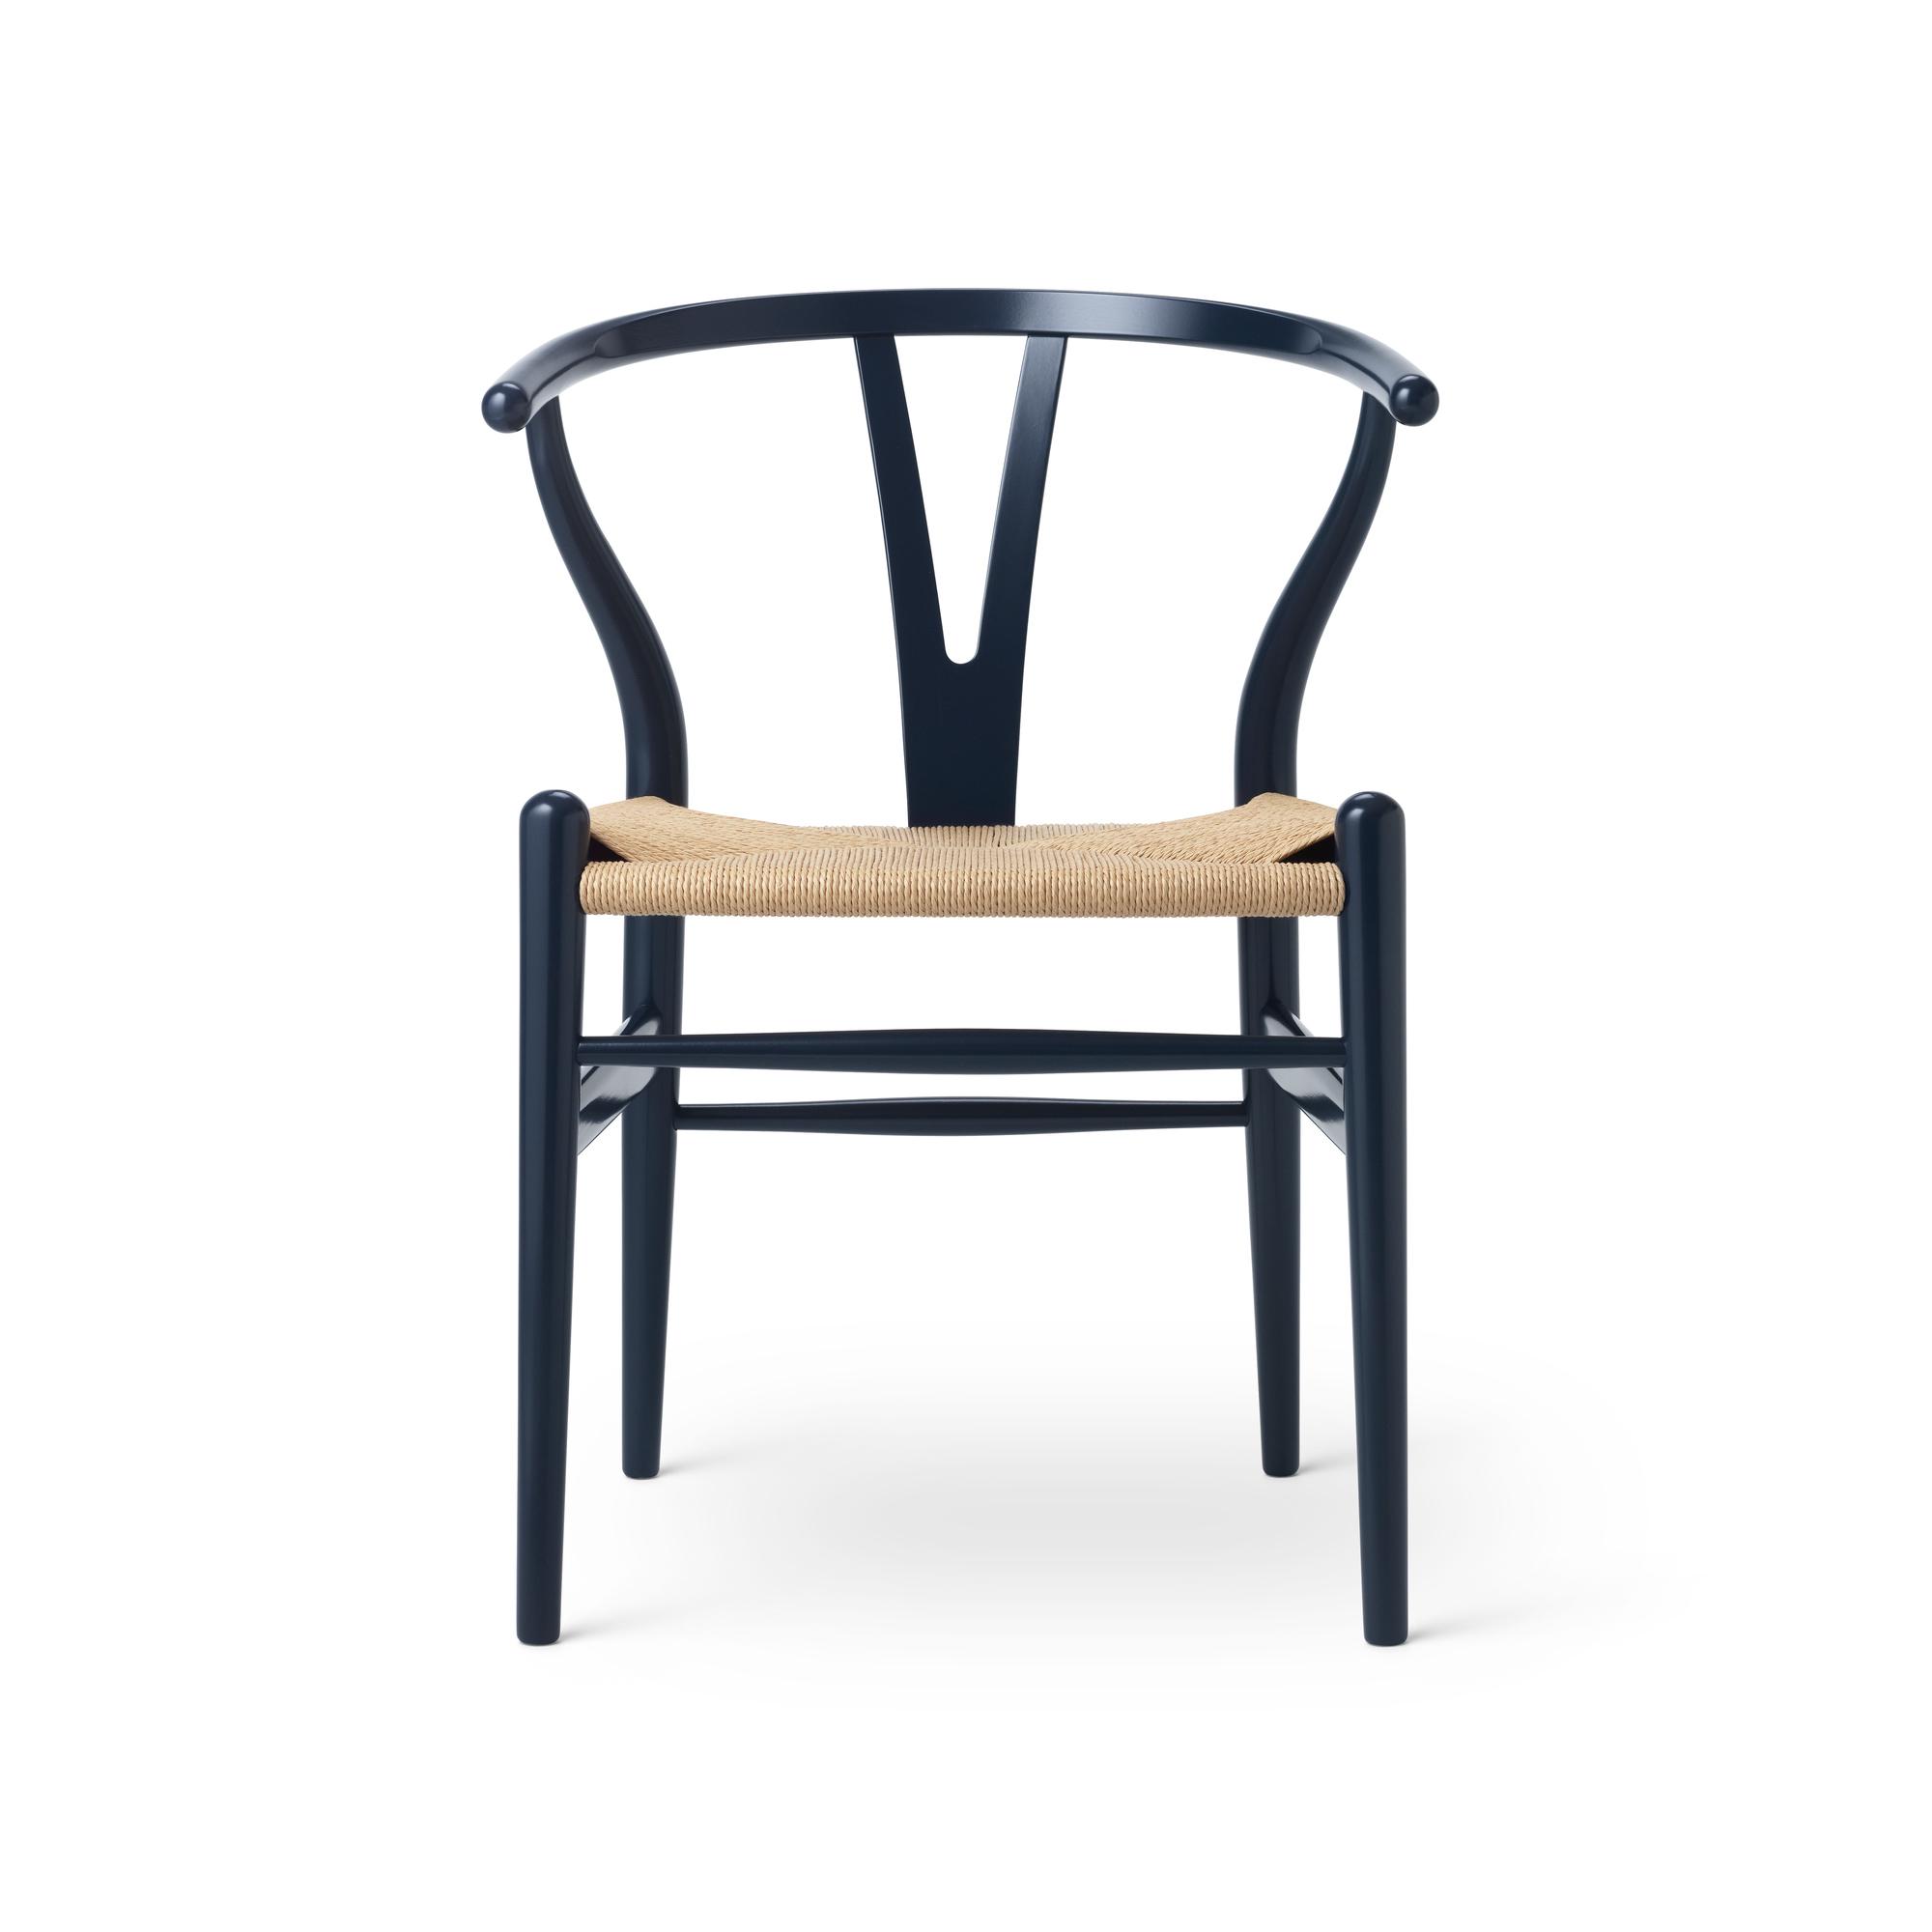 CH24 Wishbone Chair Russet & Blues or Harmony ChaiseCarl Hansen& Søn